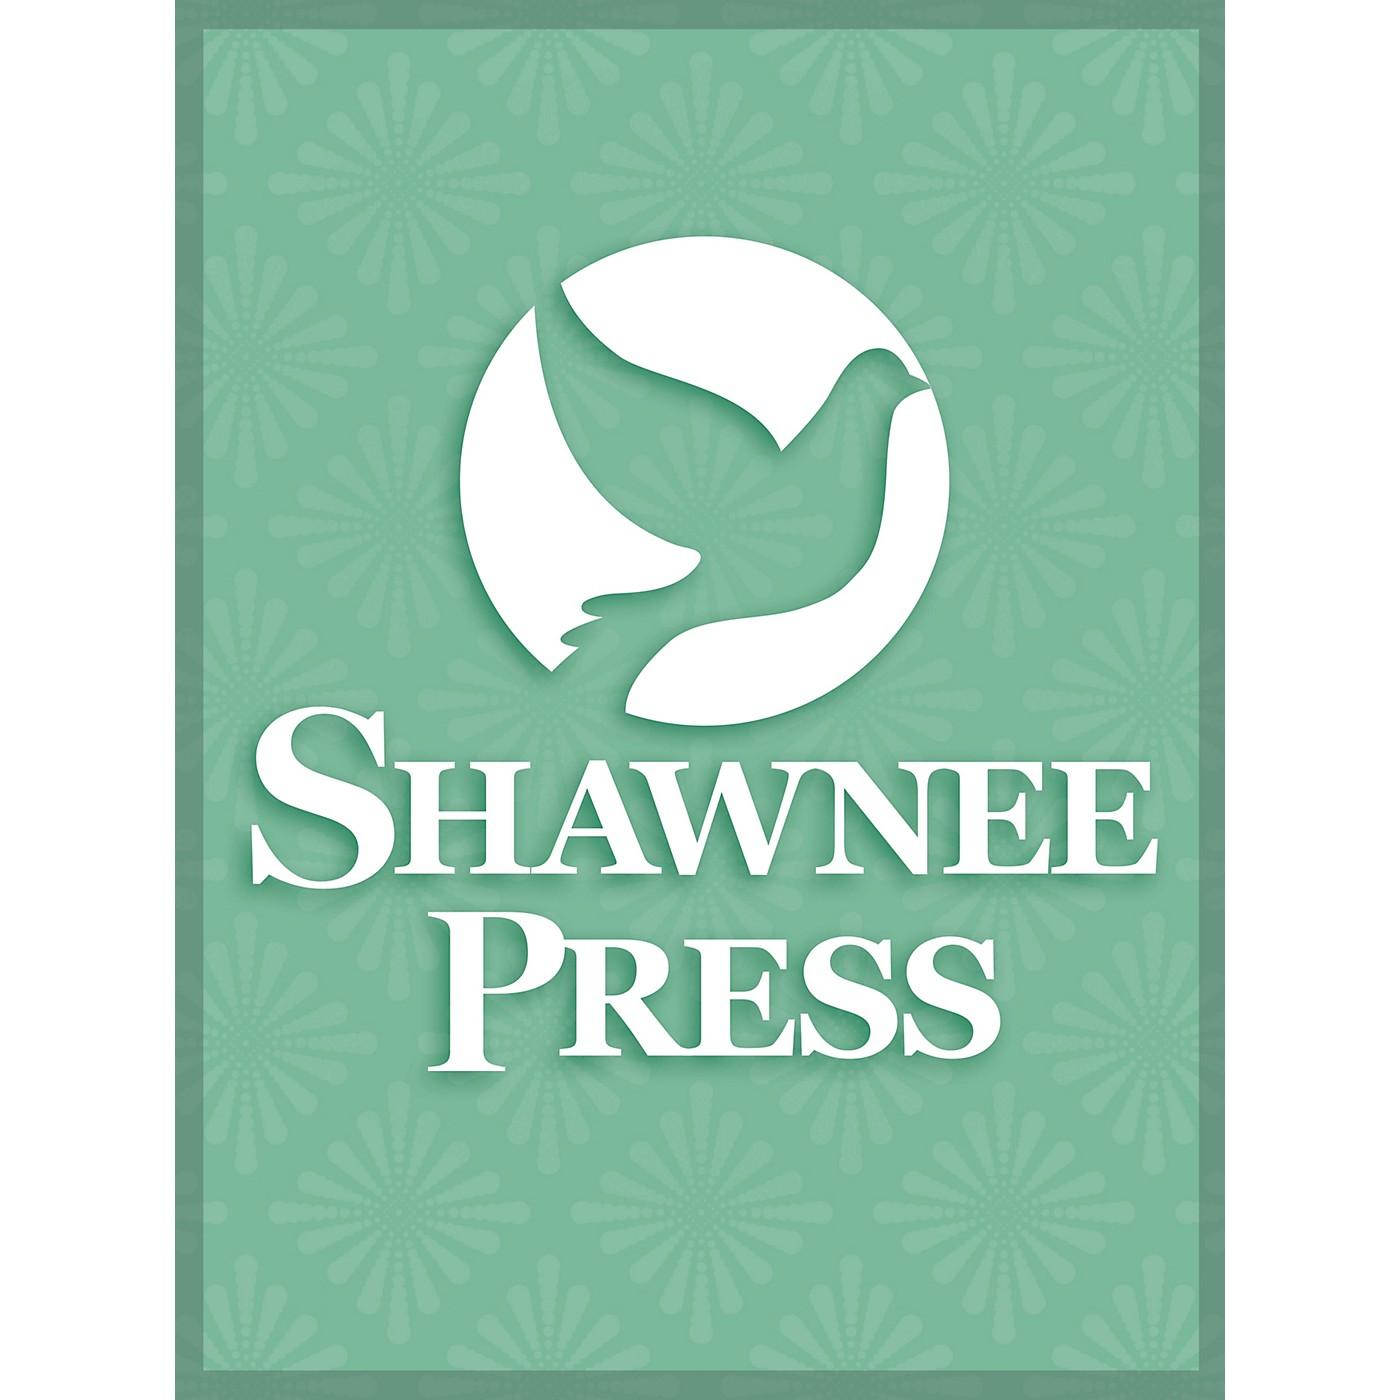 Shawnee Press Quartet for Strings (String Quartet) Shawnee Press Series Composed by W.A. Mozart thumbnail